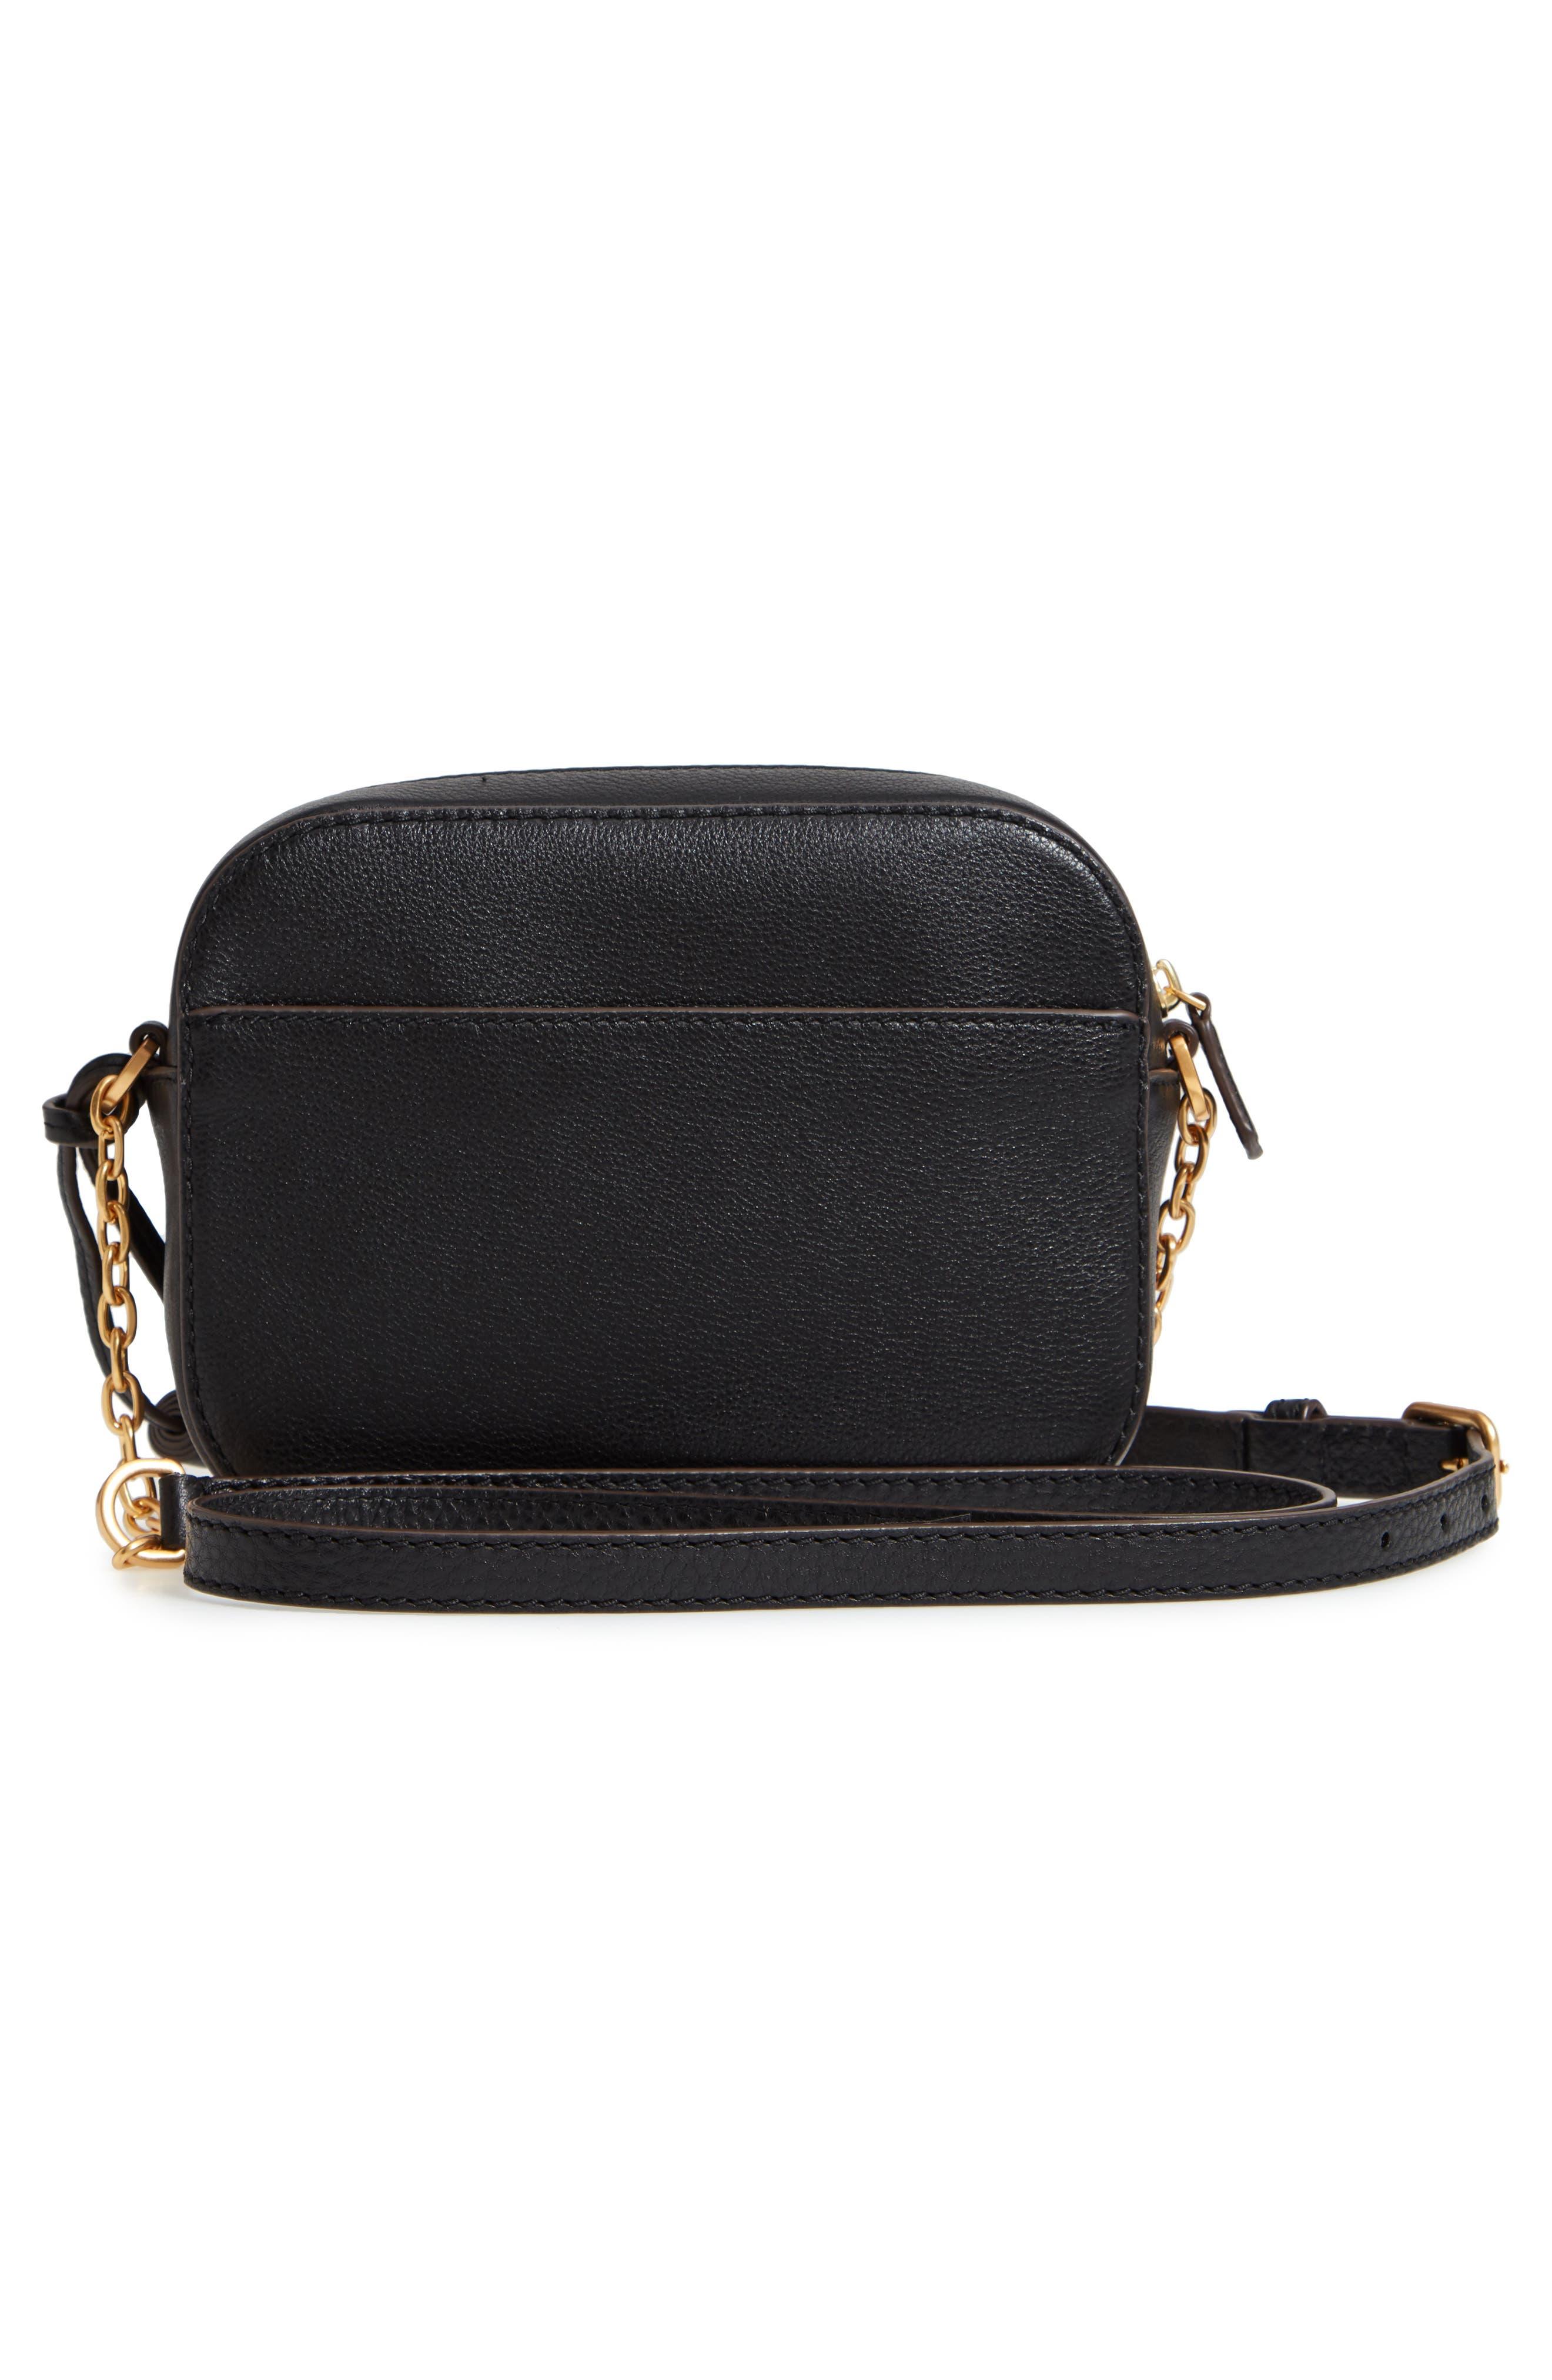 McGraw Leather Camera Bag,                             Alternate thumbnail 3, color,                             BLACK